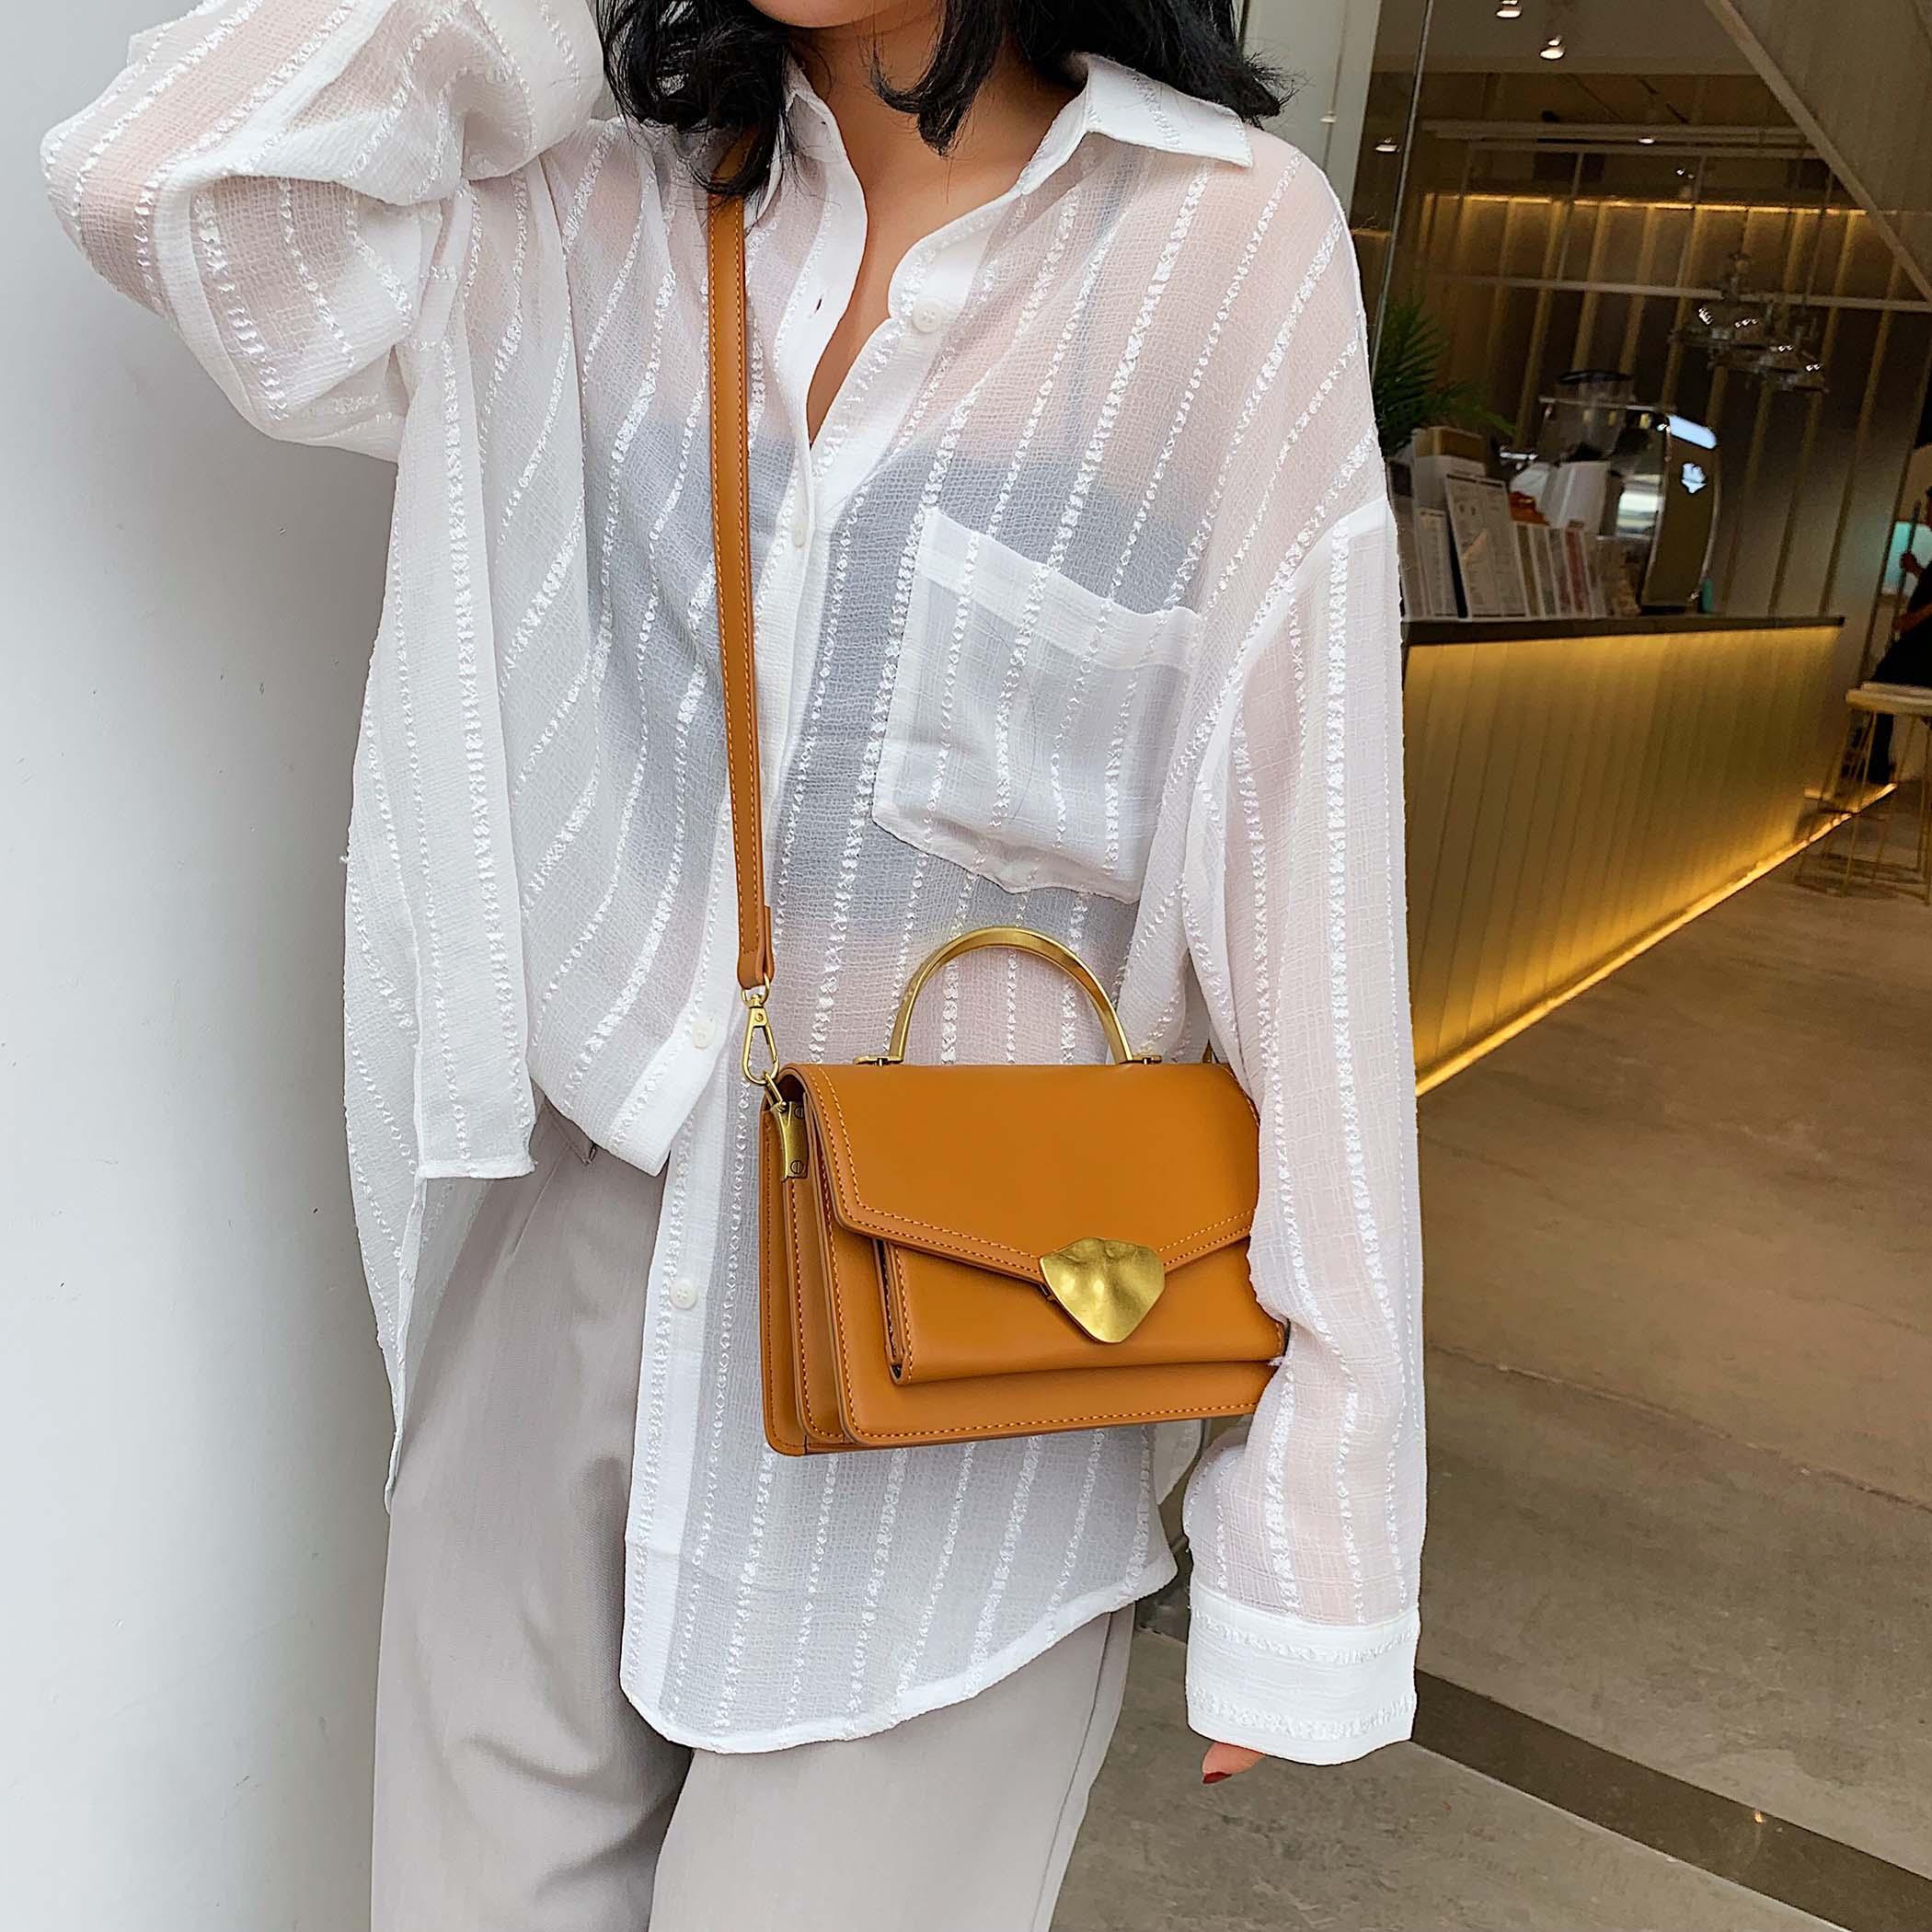 Image 4 - Simply Style PU Leather Crossbody Bags For Women Shoulder Messenger Bag Handbag Mini Tote Hand Bag With Metal Handle-in Shoulder Bags from Luggage & Bags